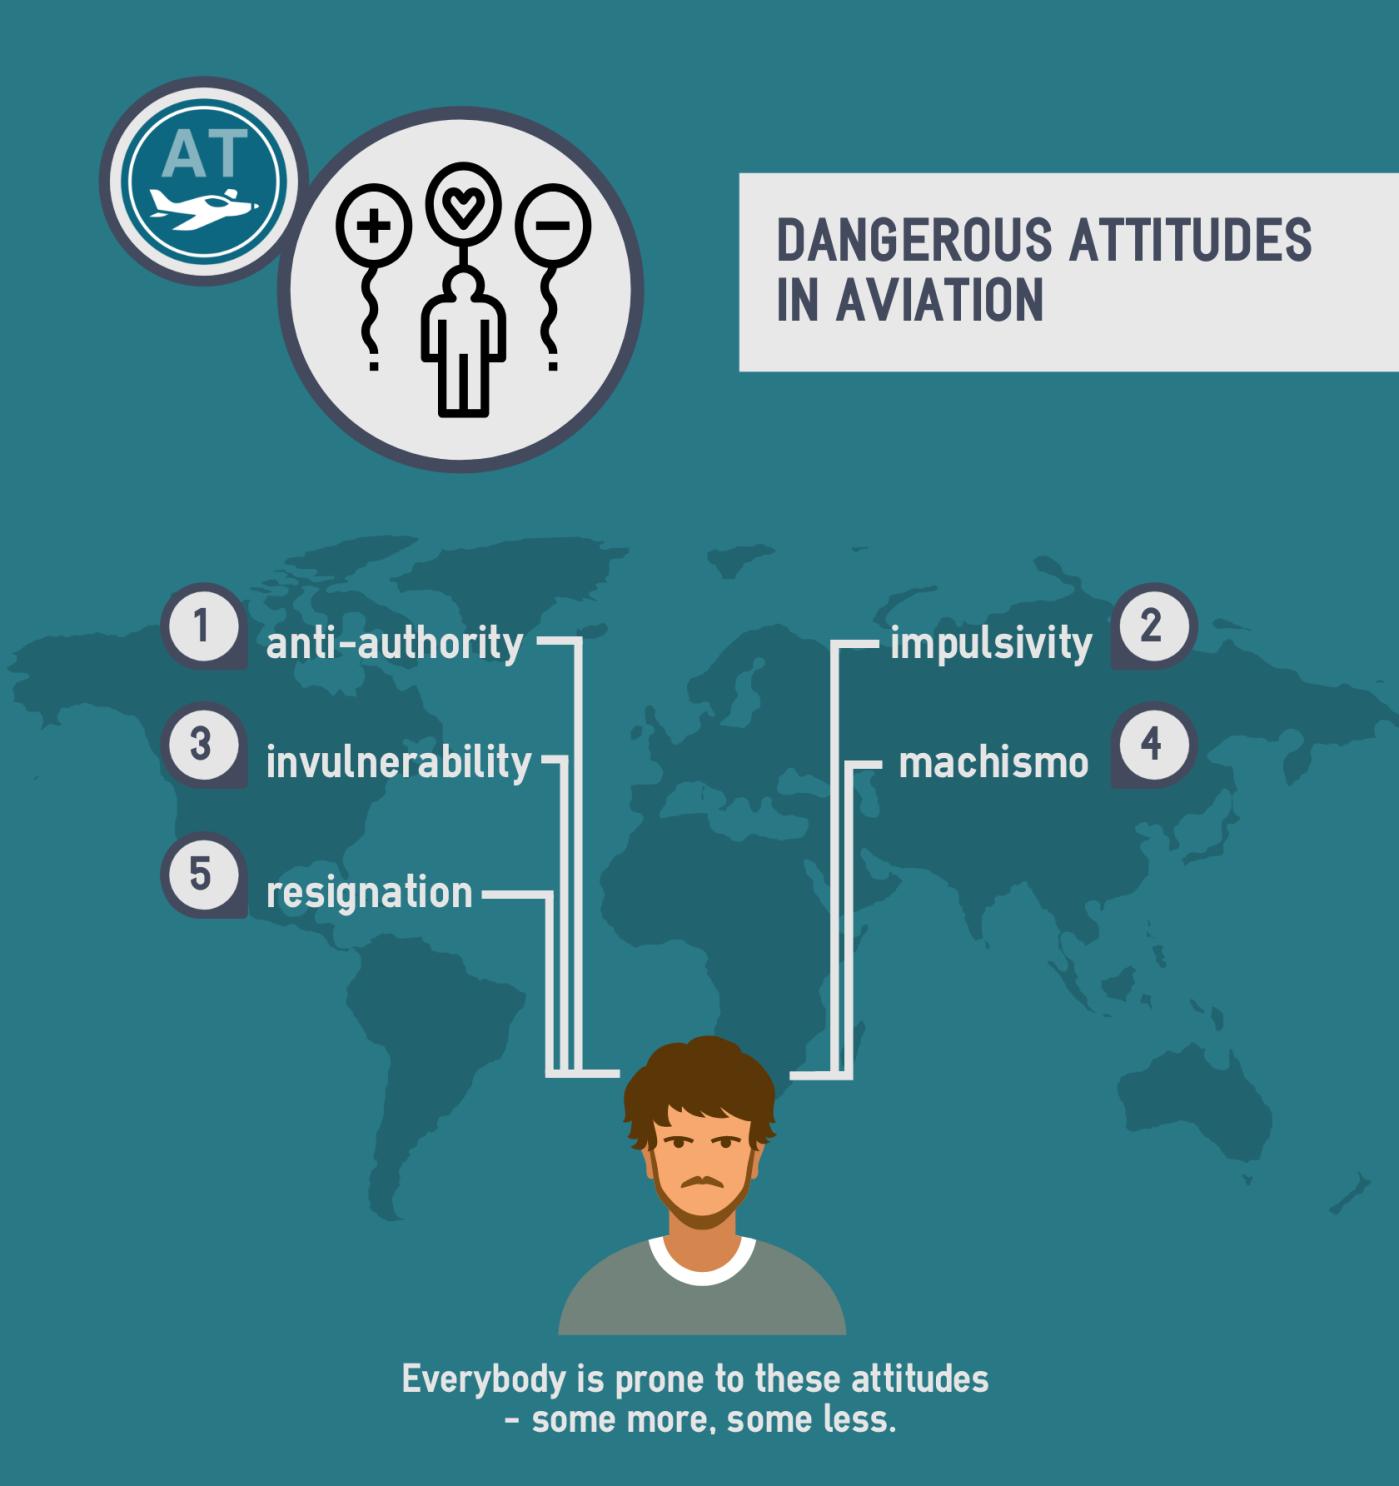 dangerous_hazardous_attitudes_in_aviation_preview